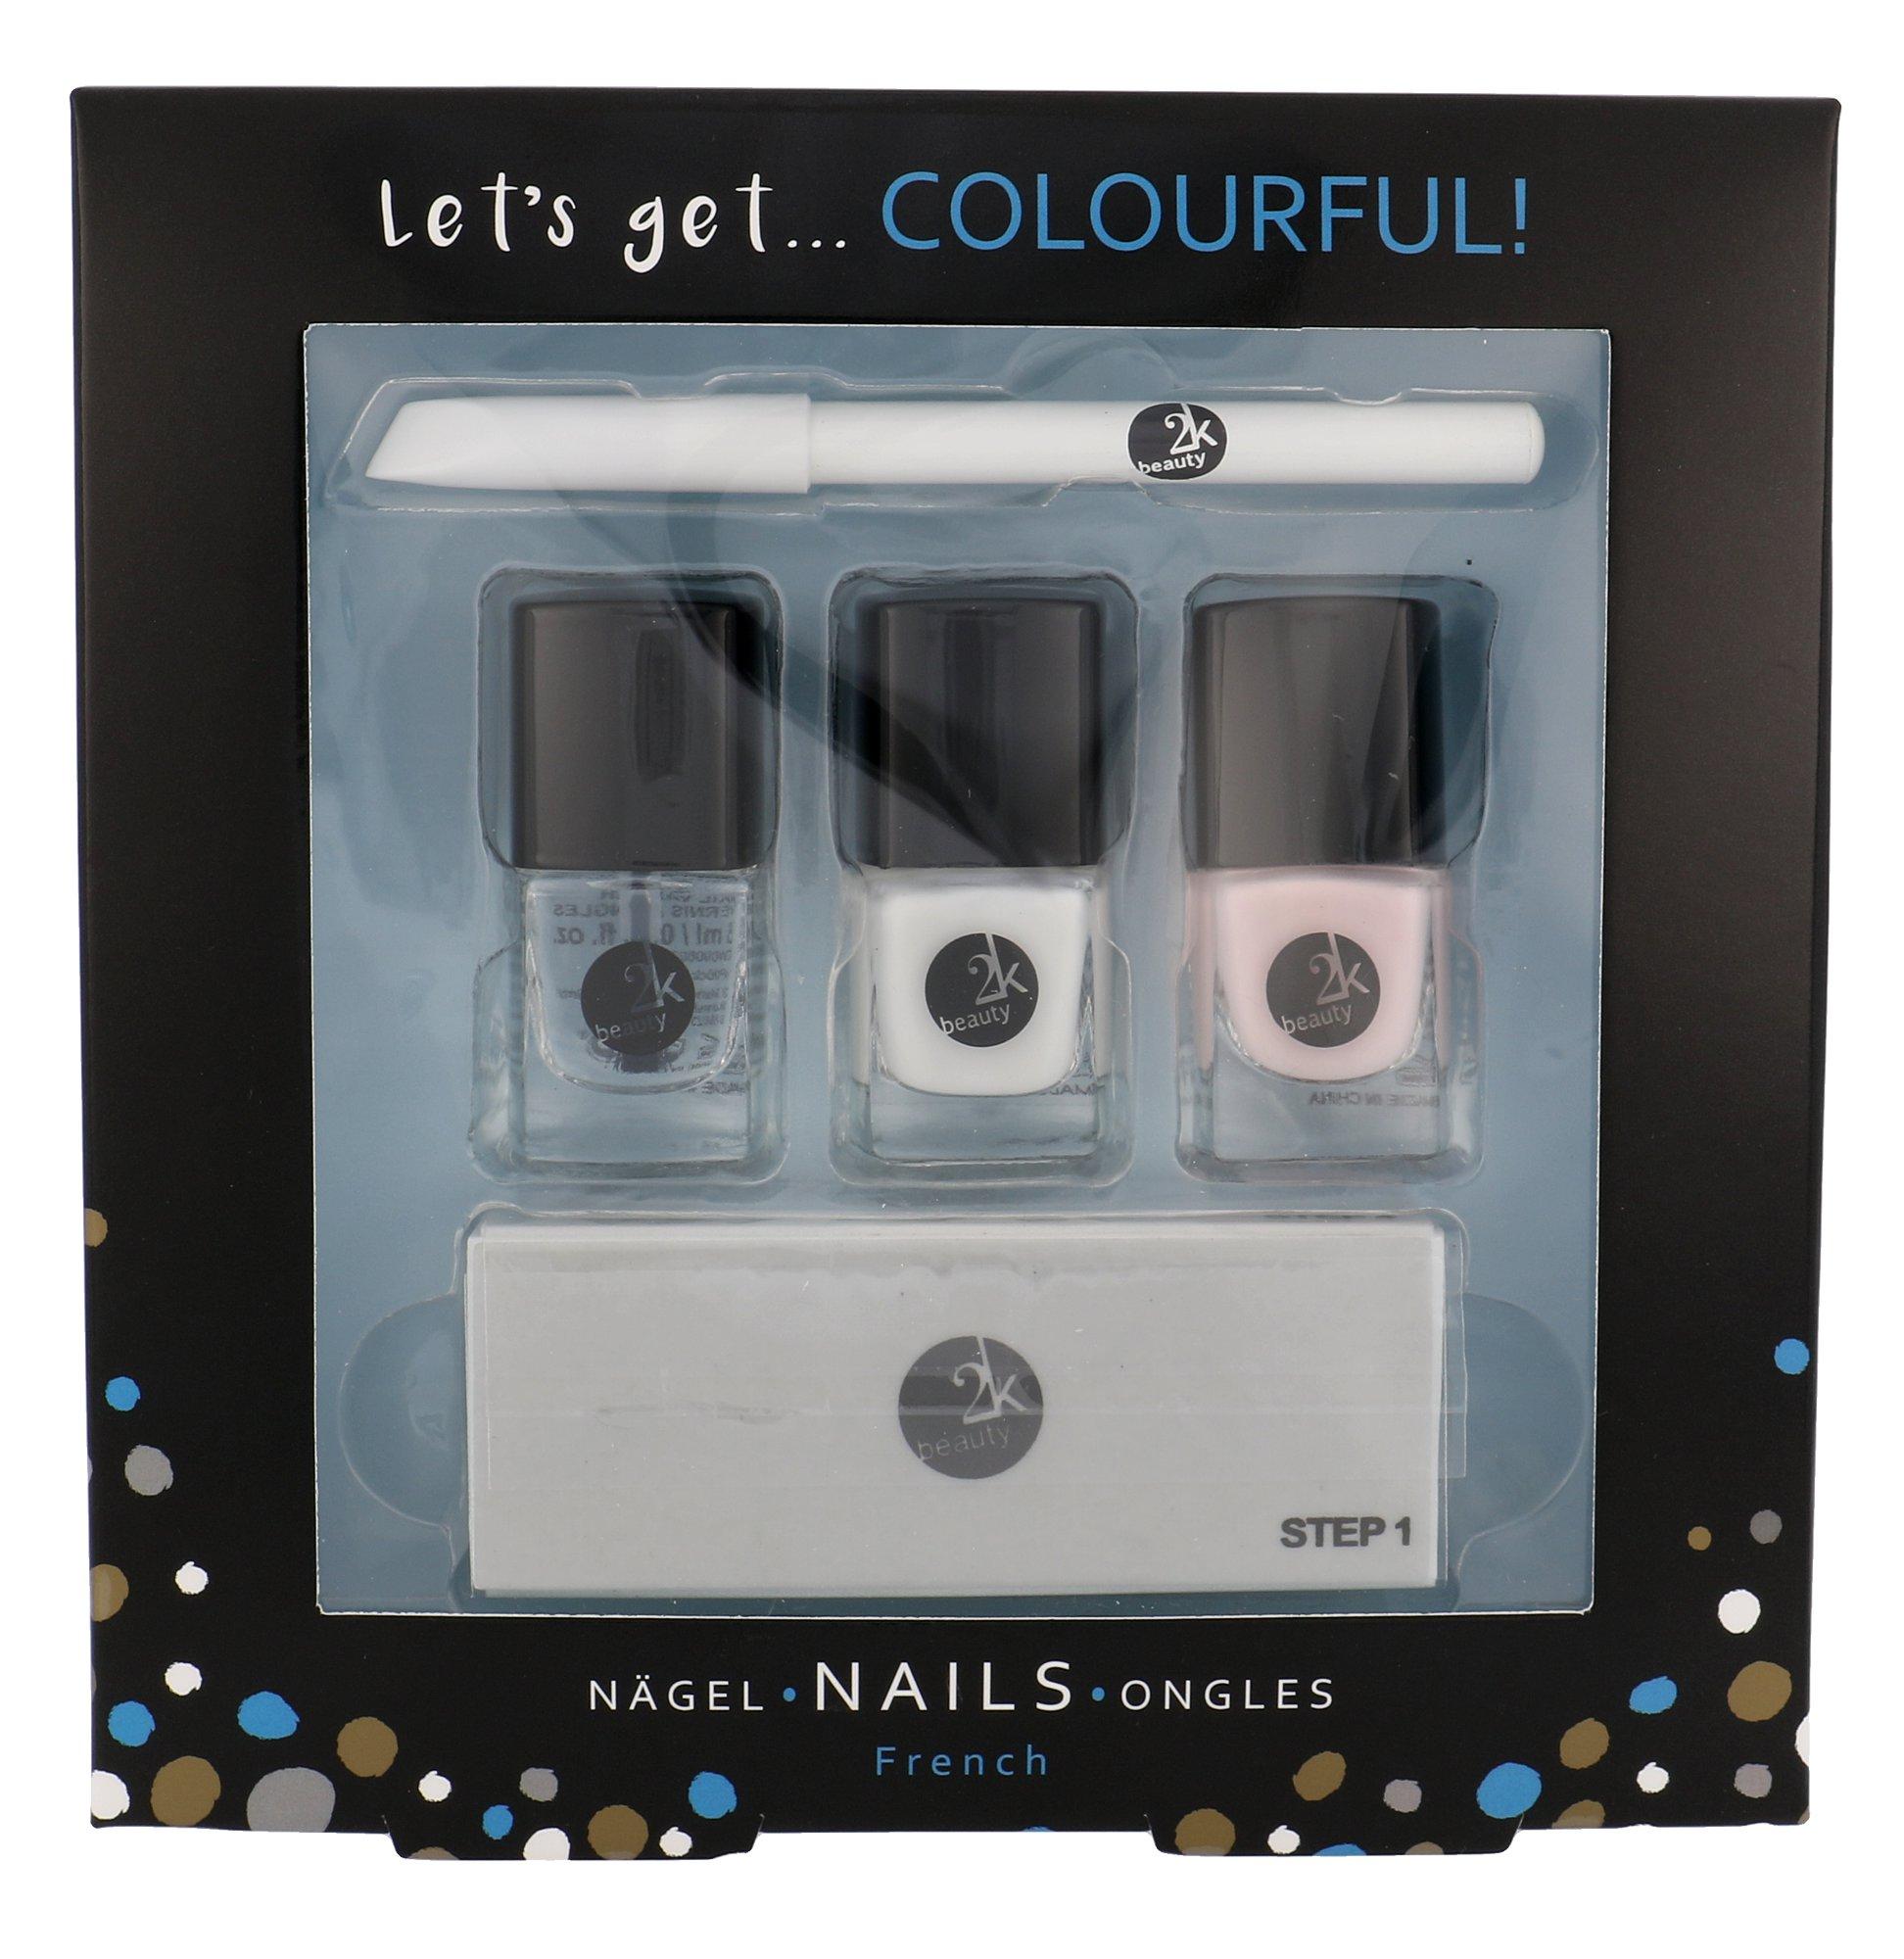 2K Let's Get Colourful! Classics Nail Polish 3 x 5 ml + Nail White Pencil 2 g + 4in1 Nail File 93781